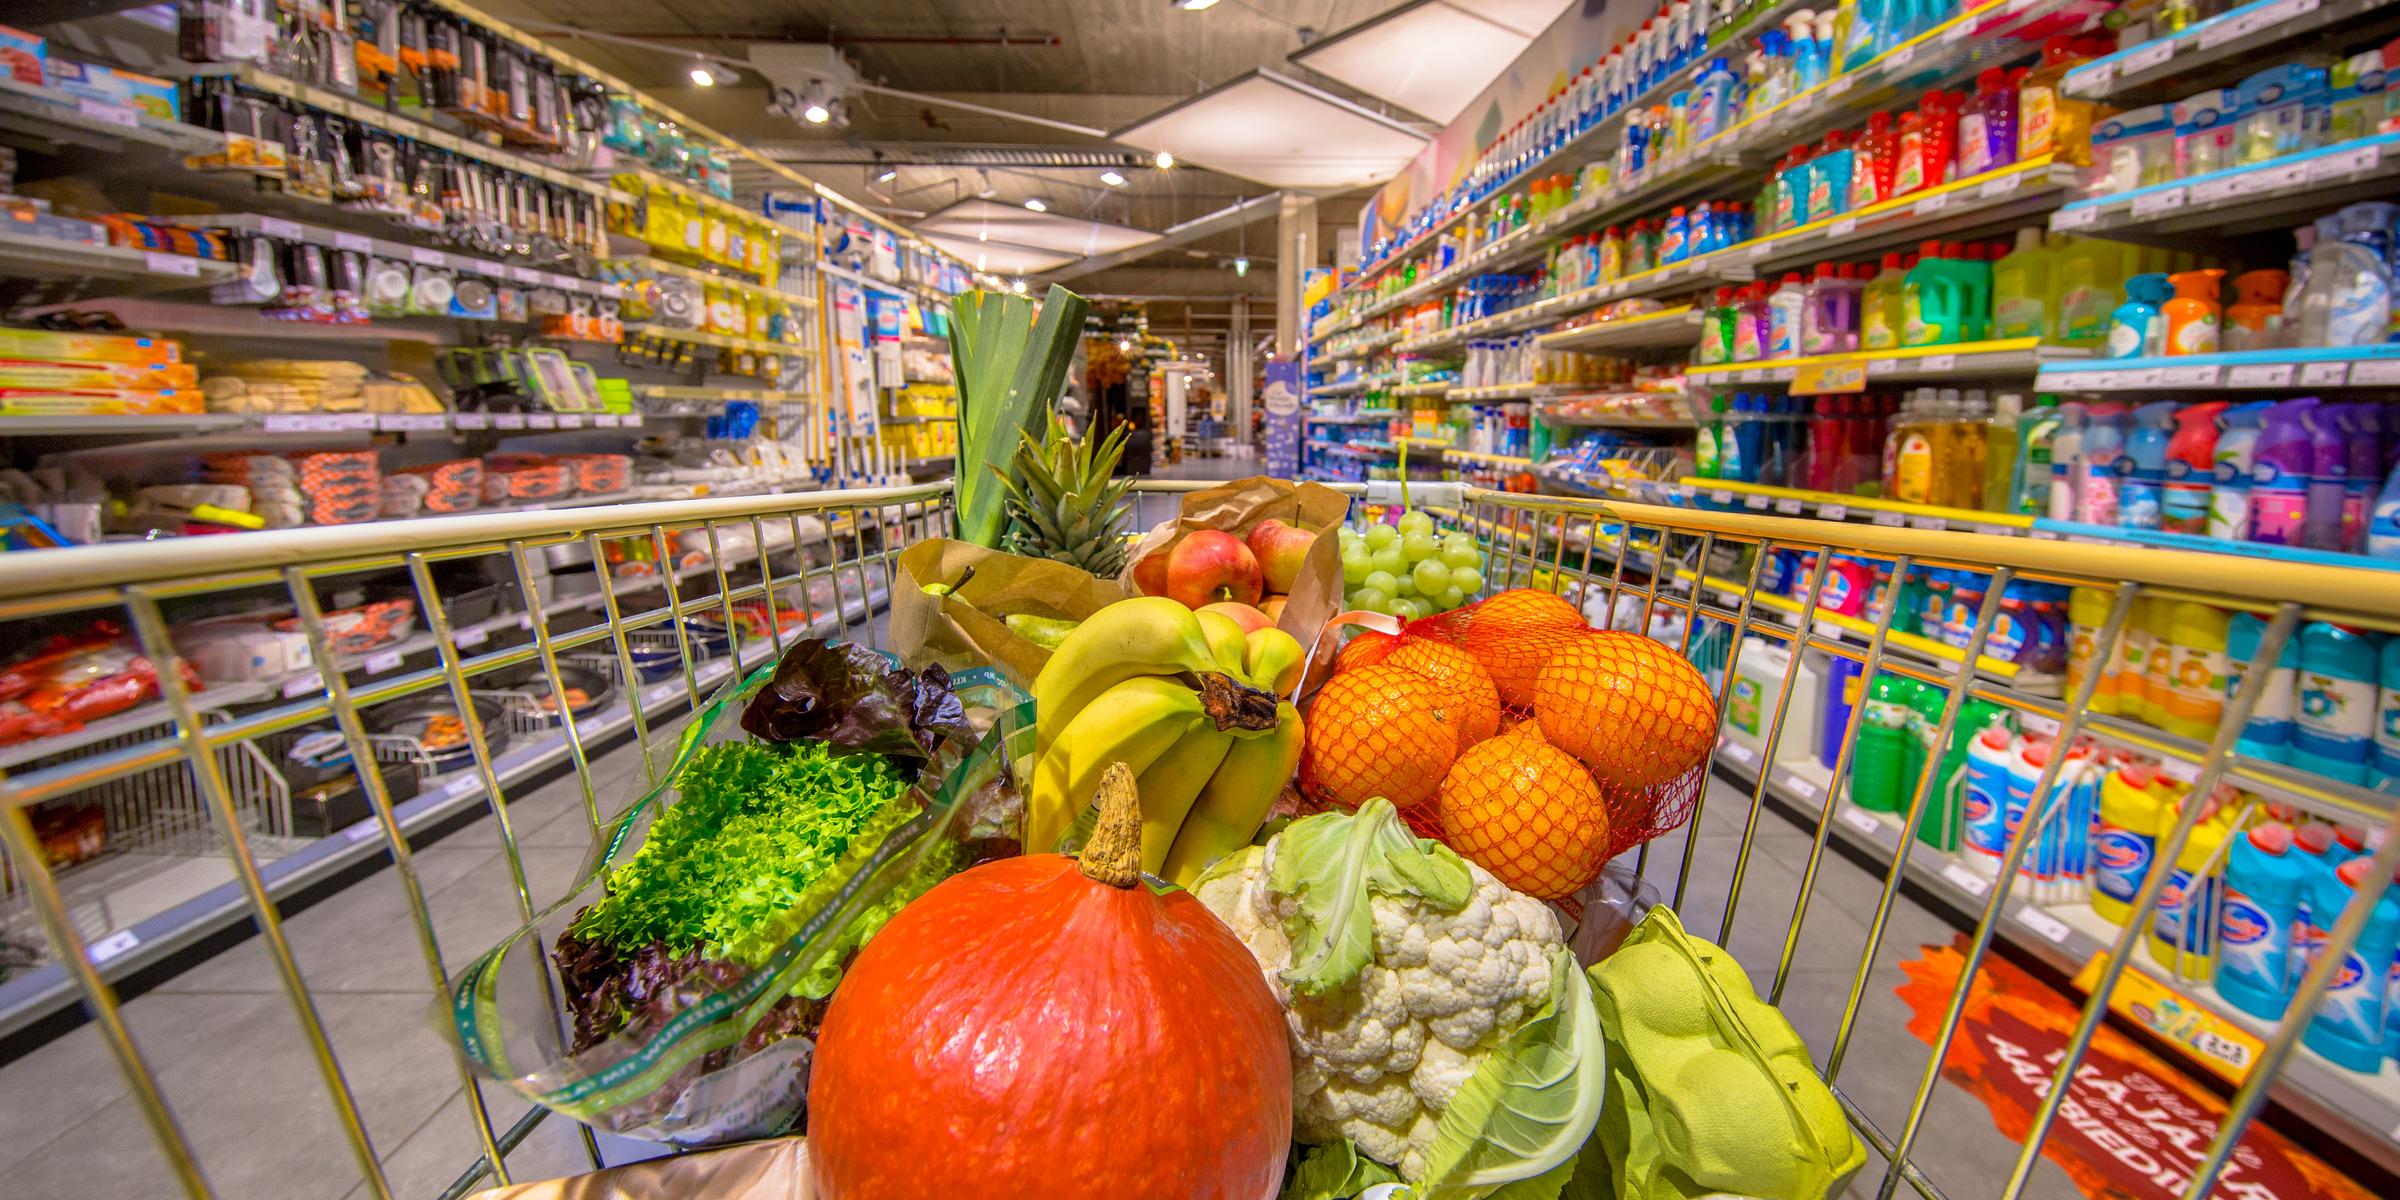 grocery_shopping_sunday.jpg